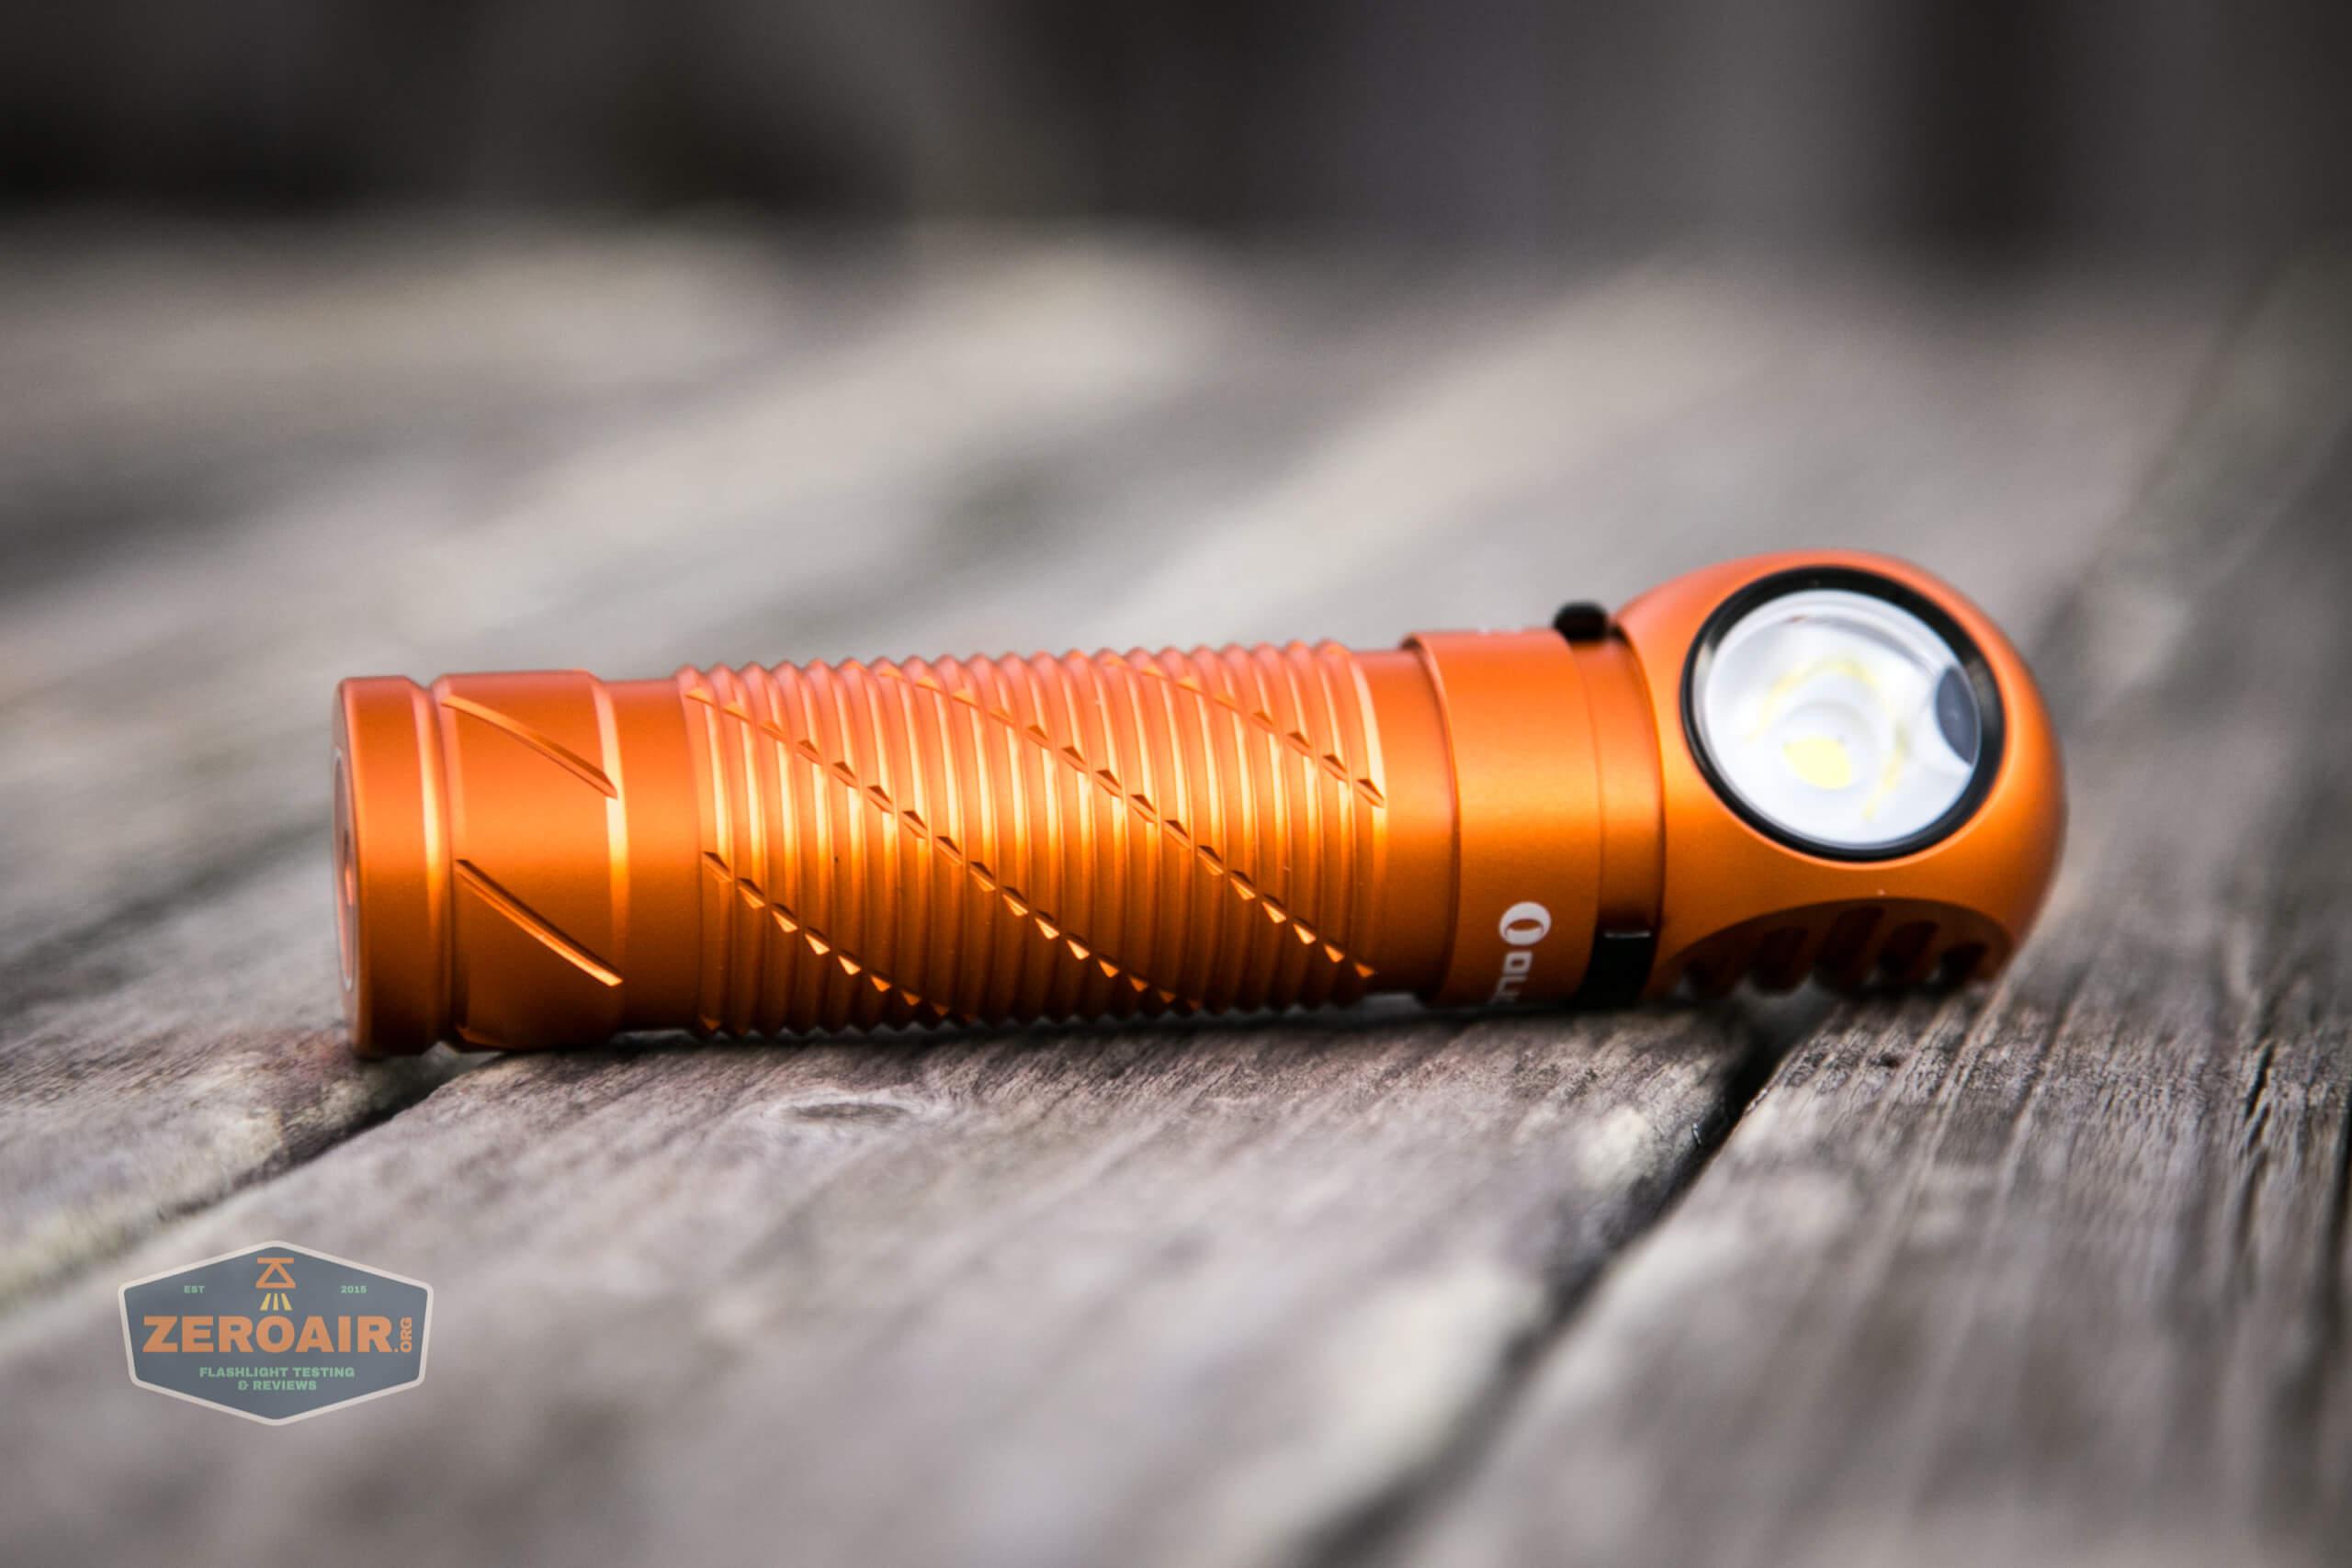 olight perun 2 21700 headlamp orange laying on side